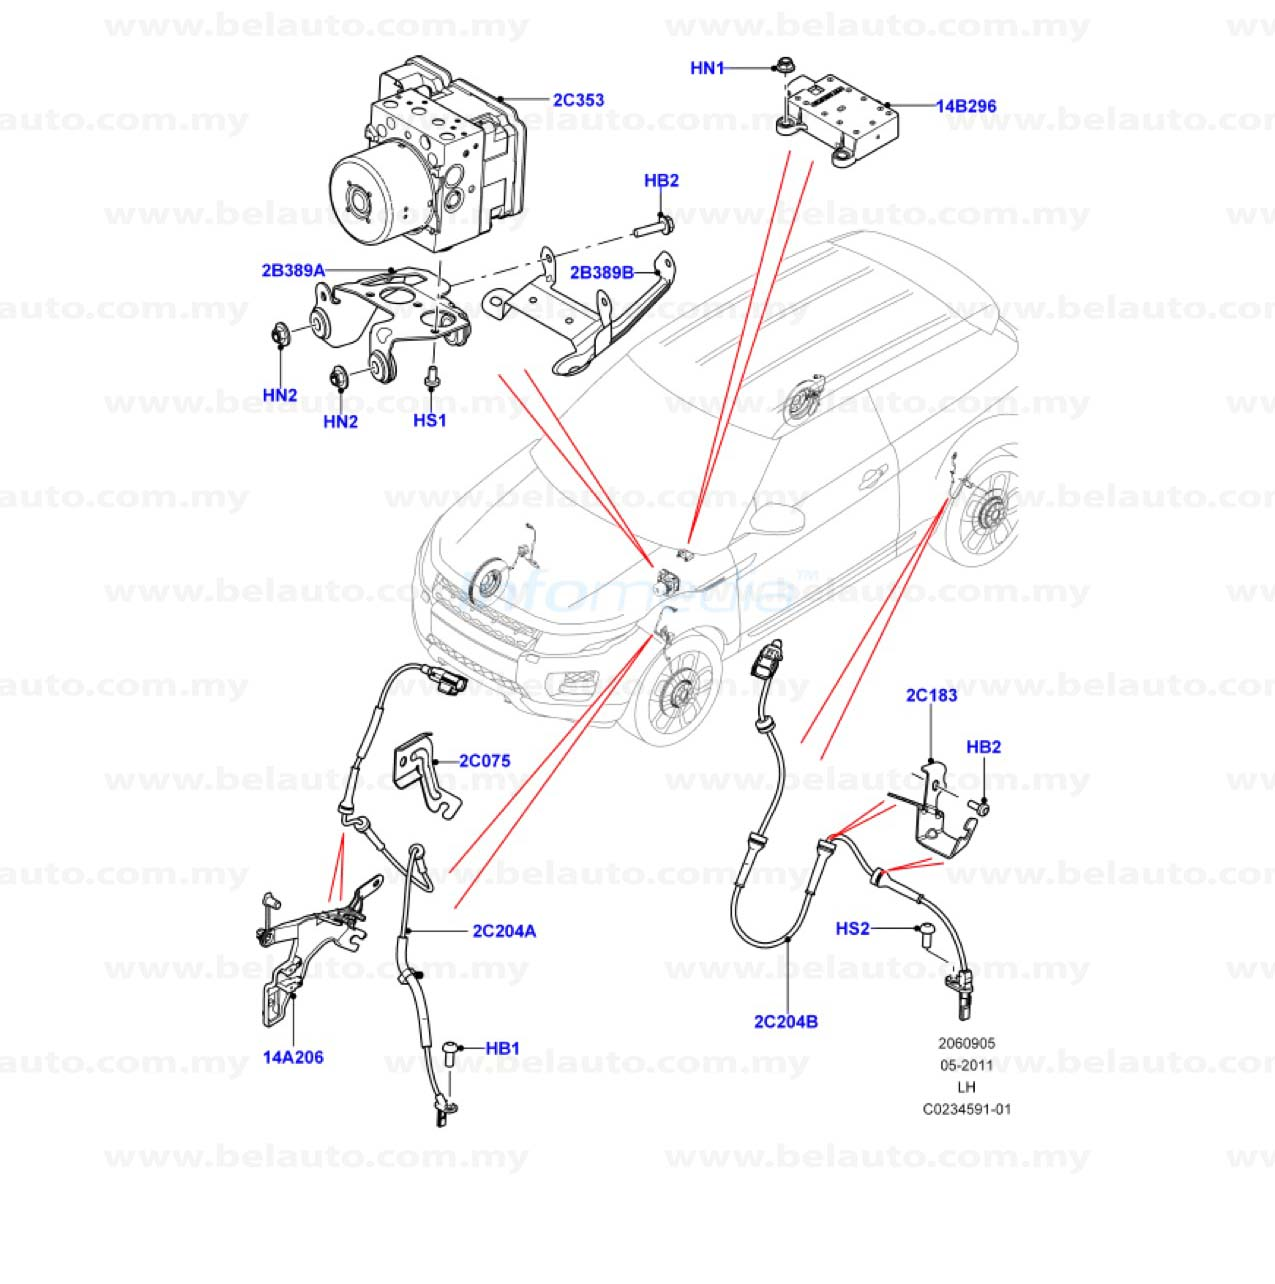 206 09 Chassis Anti Lock Brake System